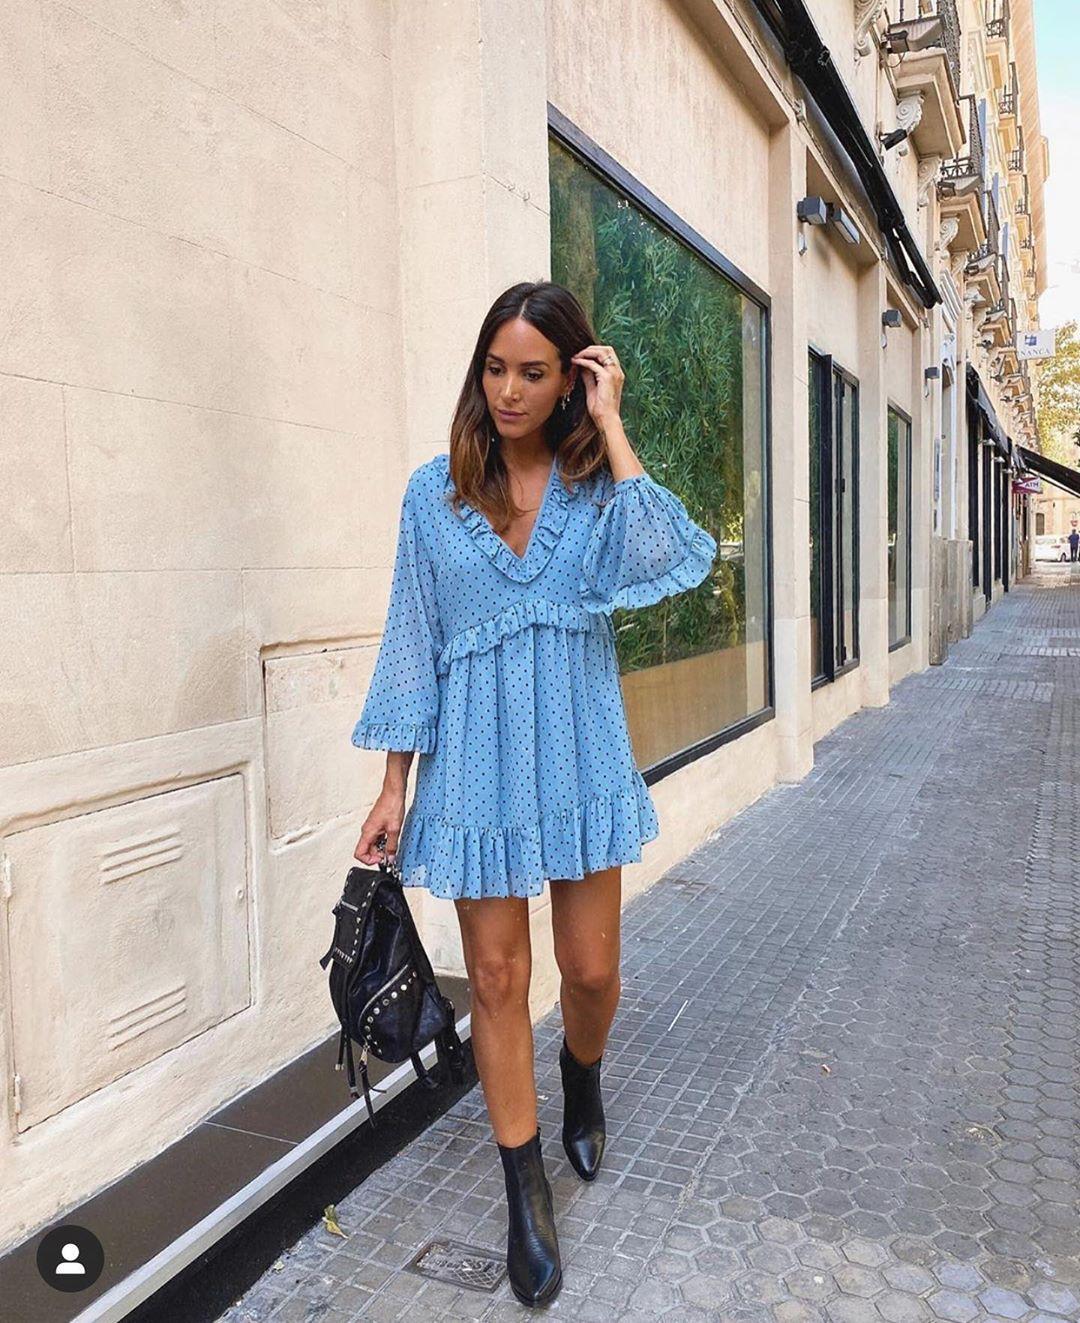 dress with polka dot and ruffles de Zara sur zarastreetstyle